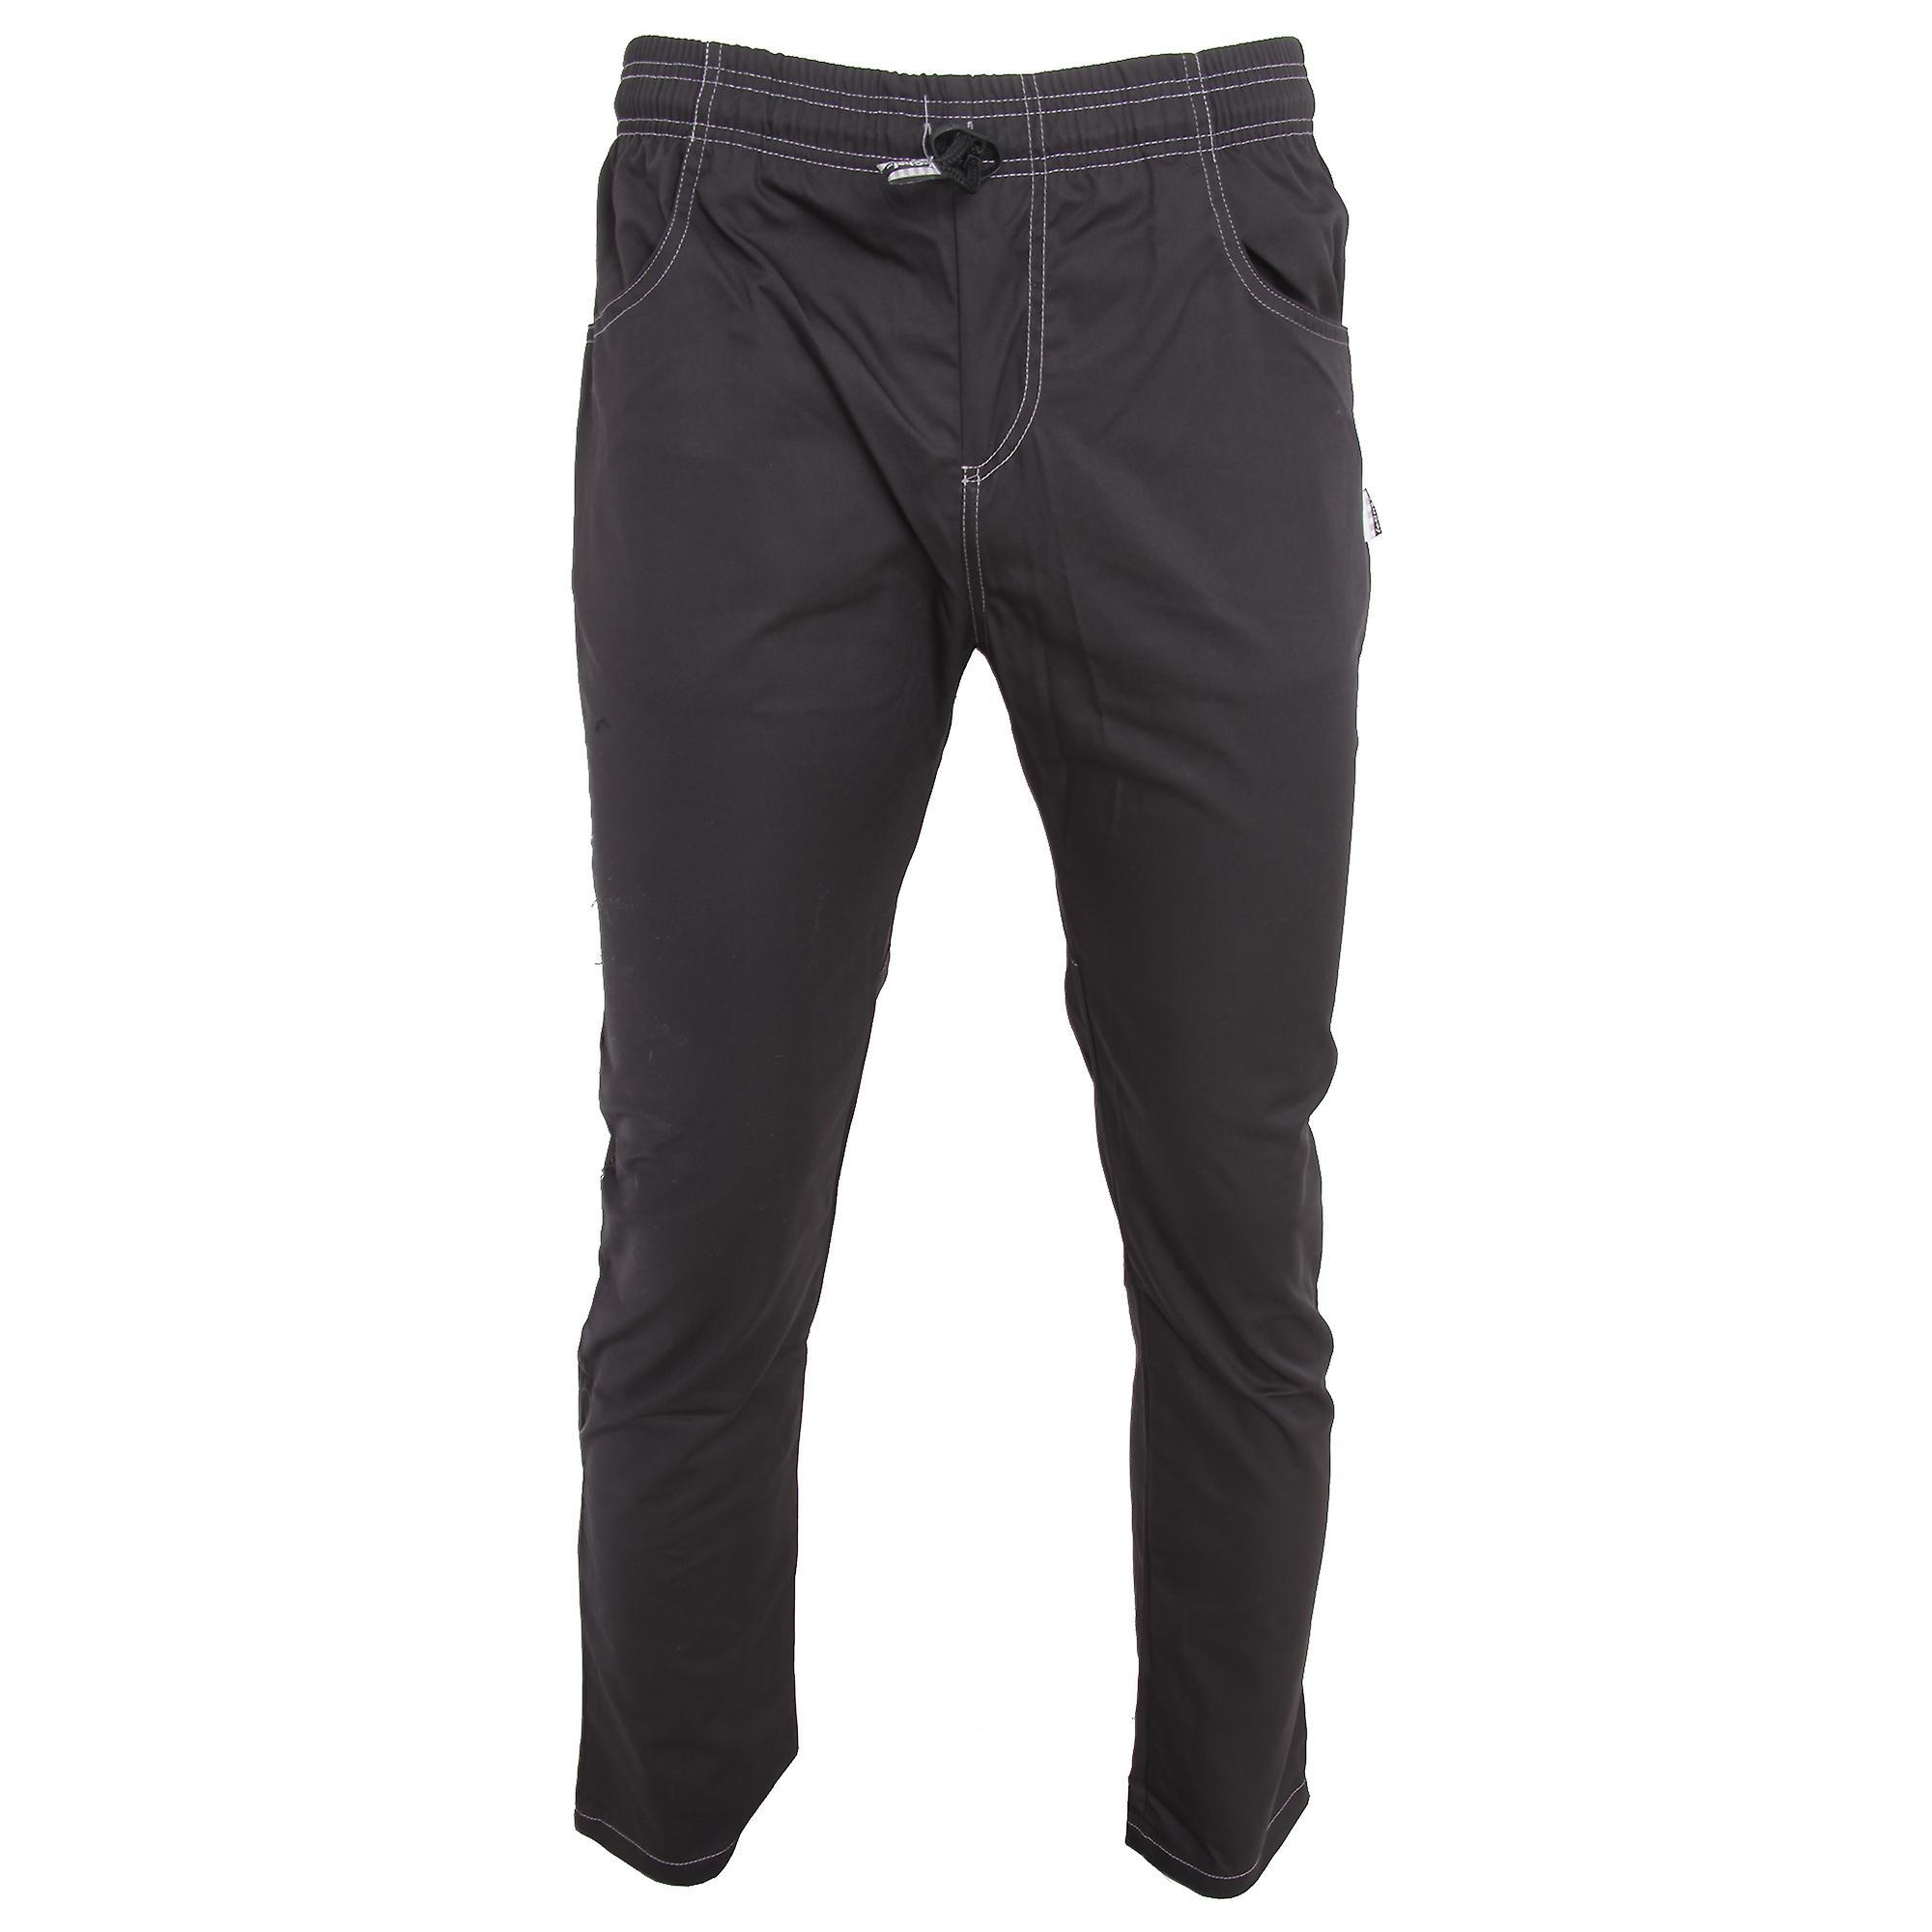 Le Chef Unisex Crease Resistant Prep Trousers